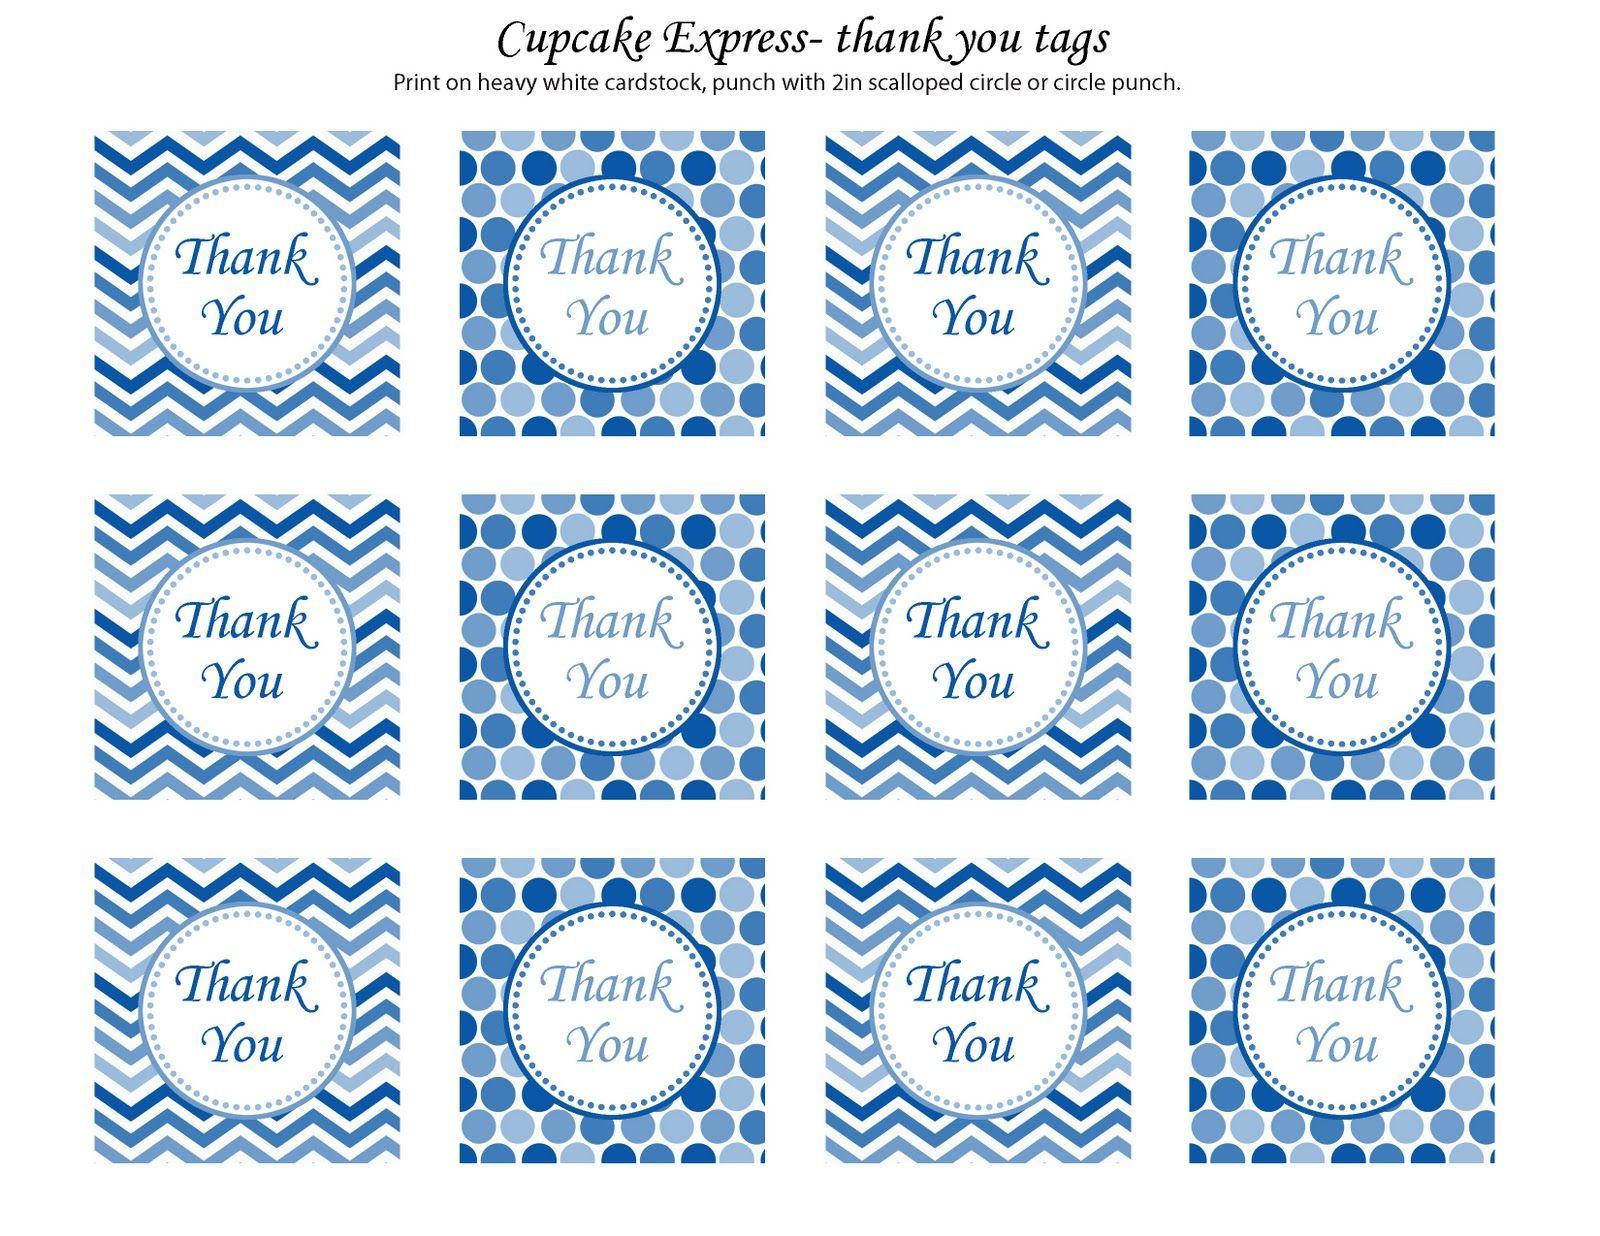 blue white thank you tab | Cupcake Express: freebies | PRINTER'S ...